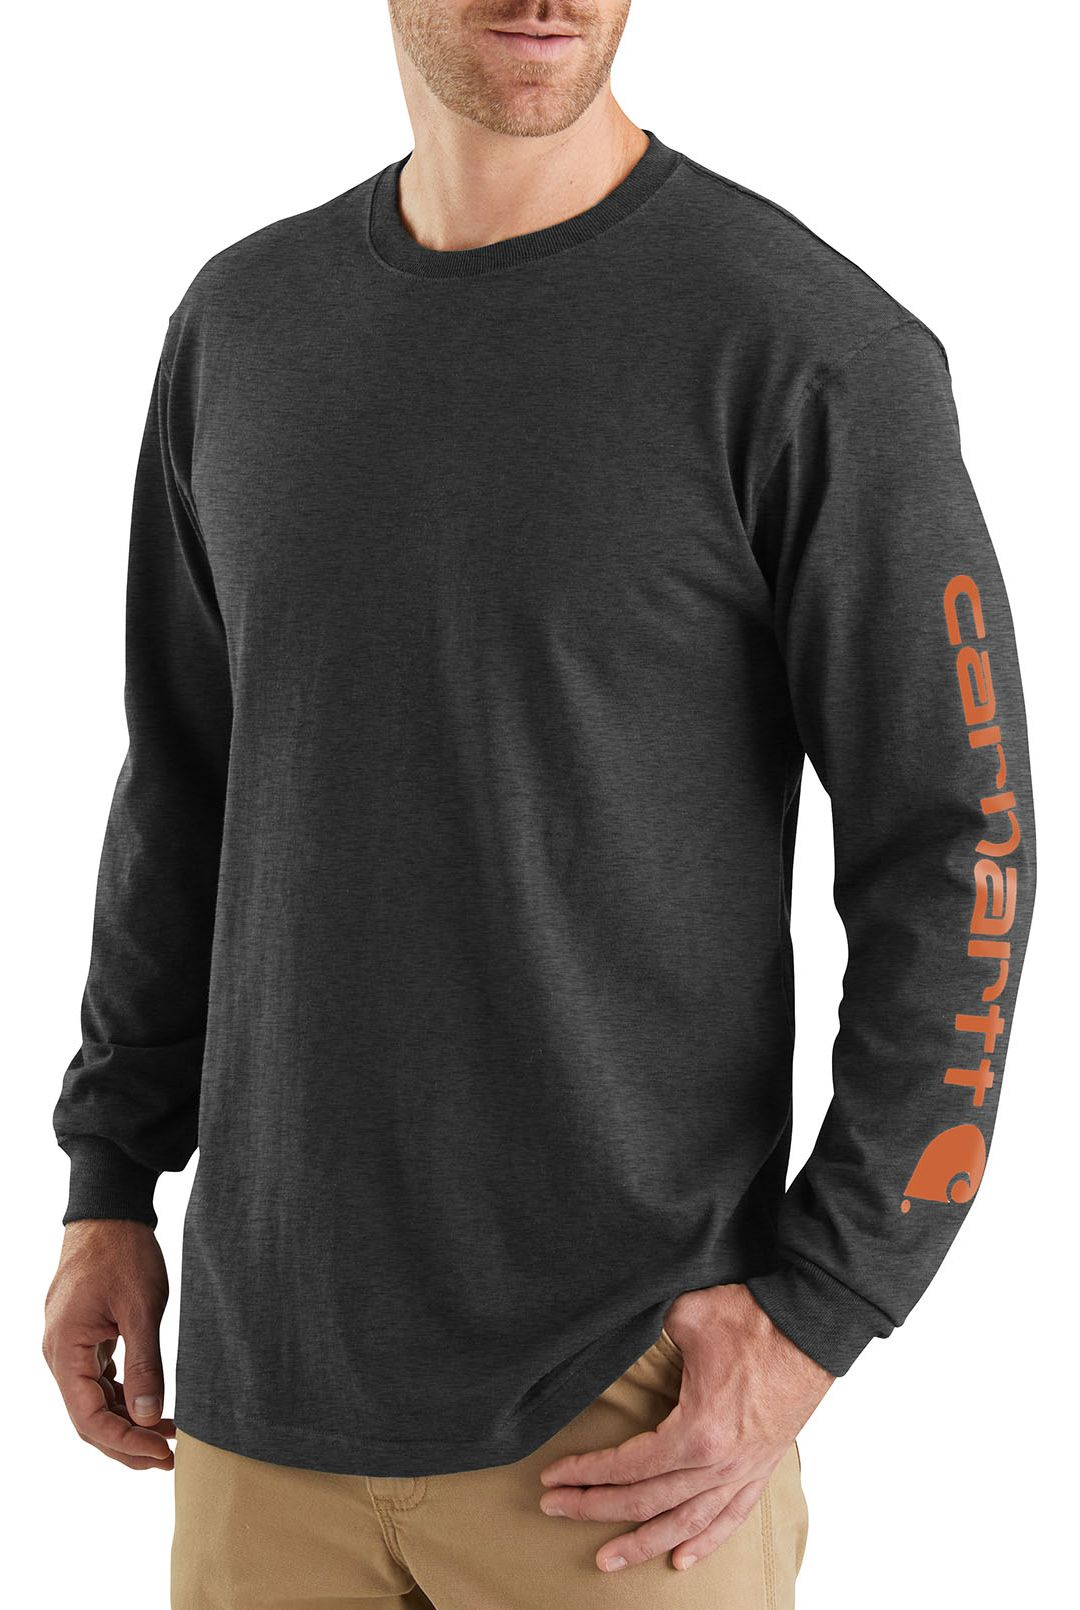 a4cfa26cb Carhartt Men's Graphic Logo Long Sleeve Shirt | Field & Stream